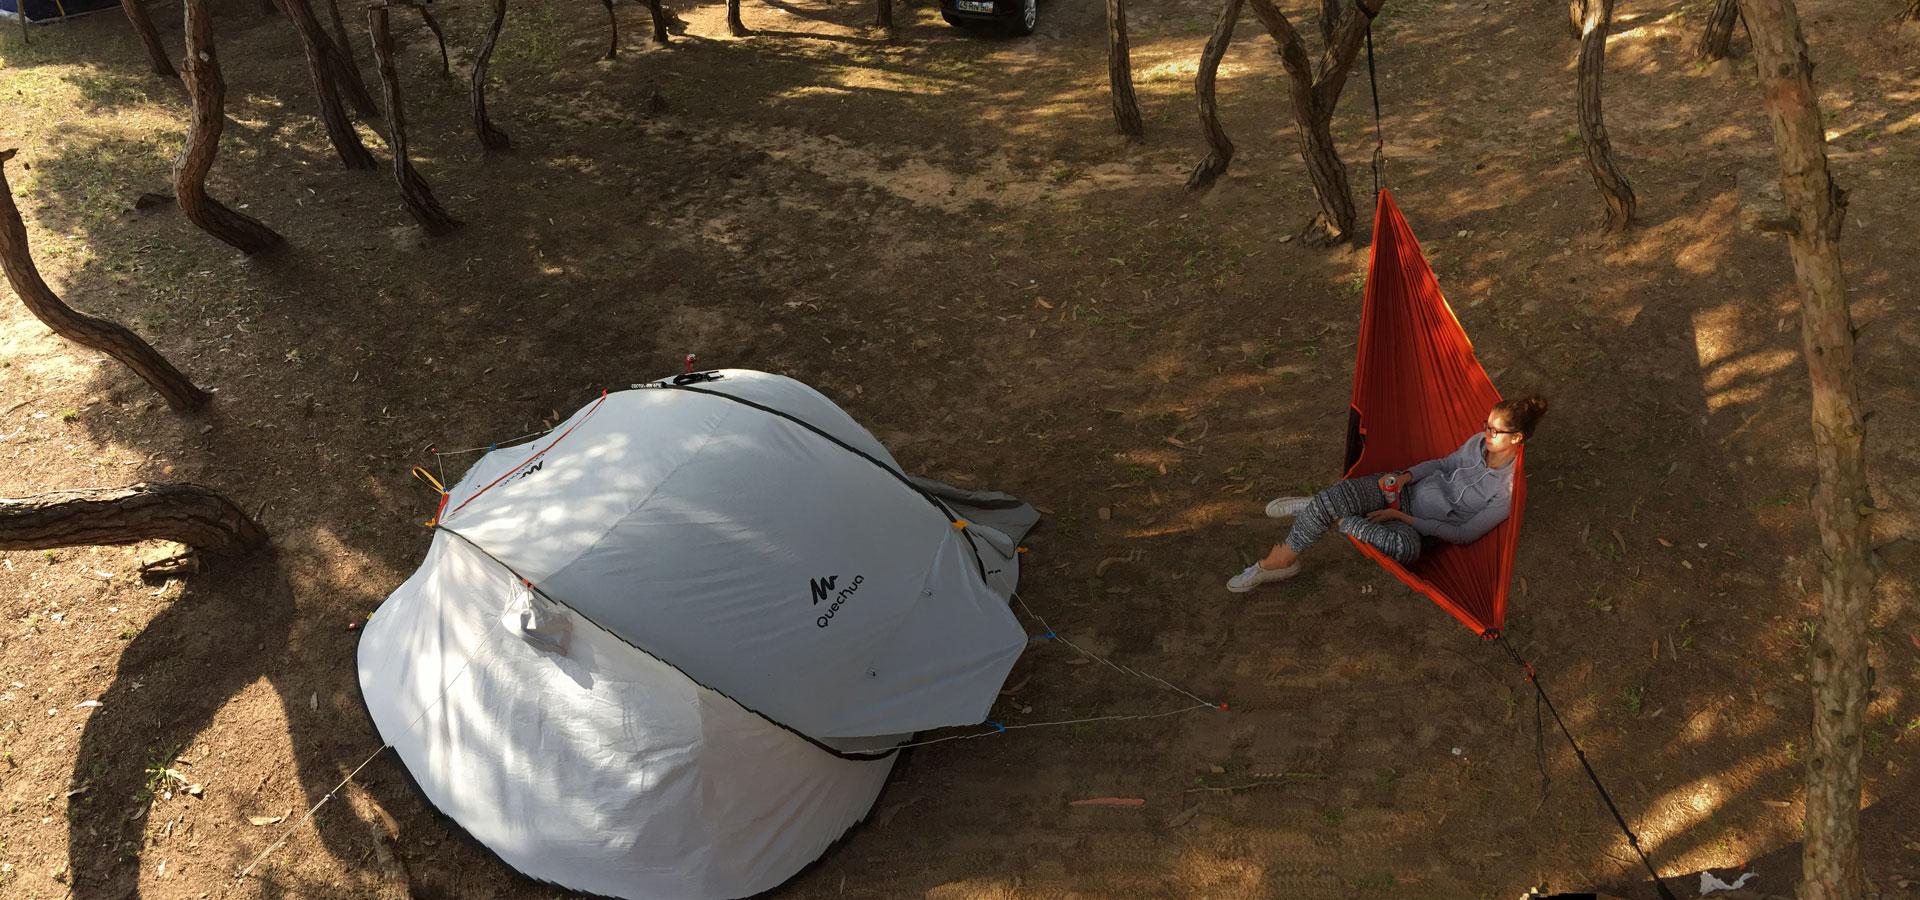 Campingplatz nahe Lissabon - Portugal